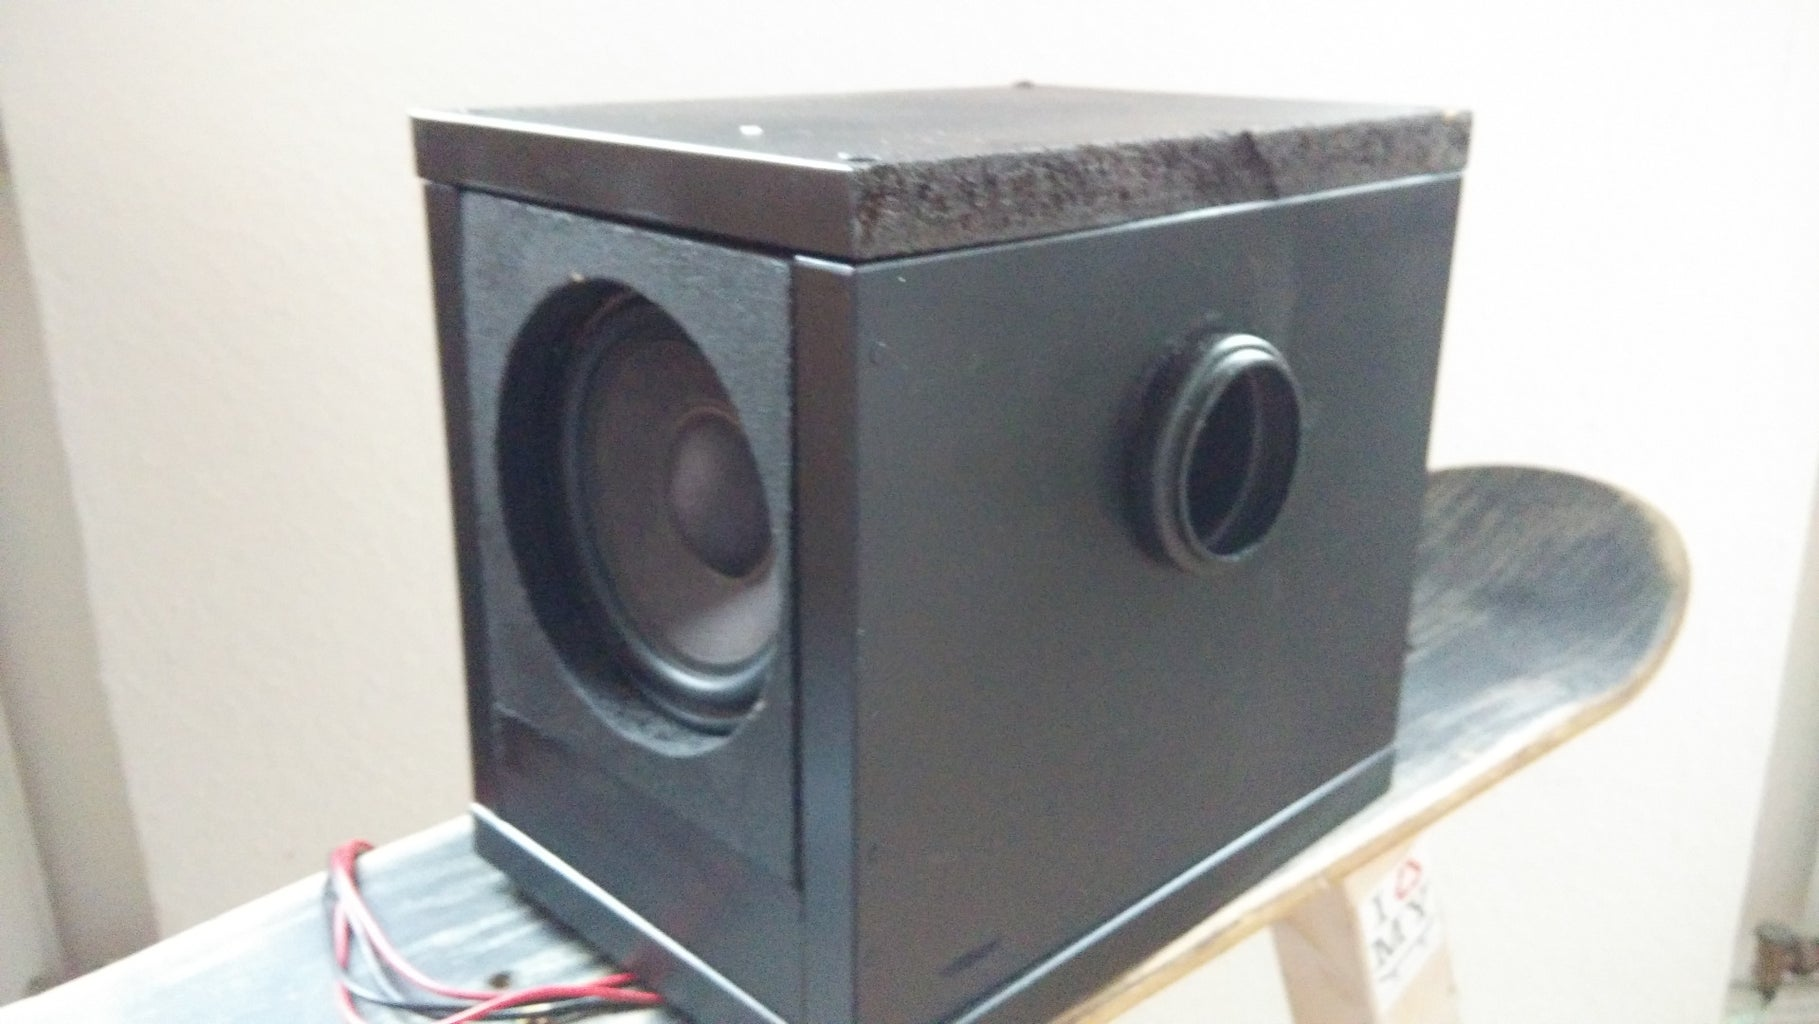 Speakers and Speaker Housing